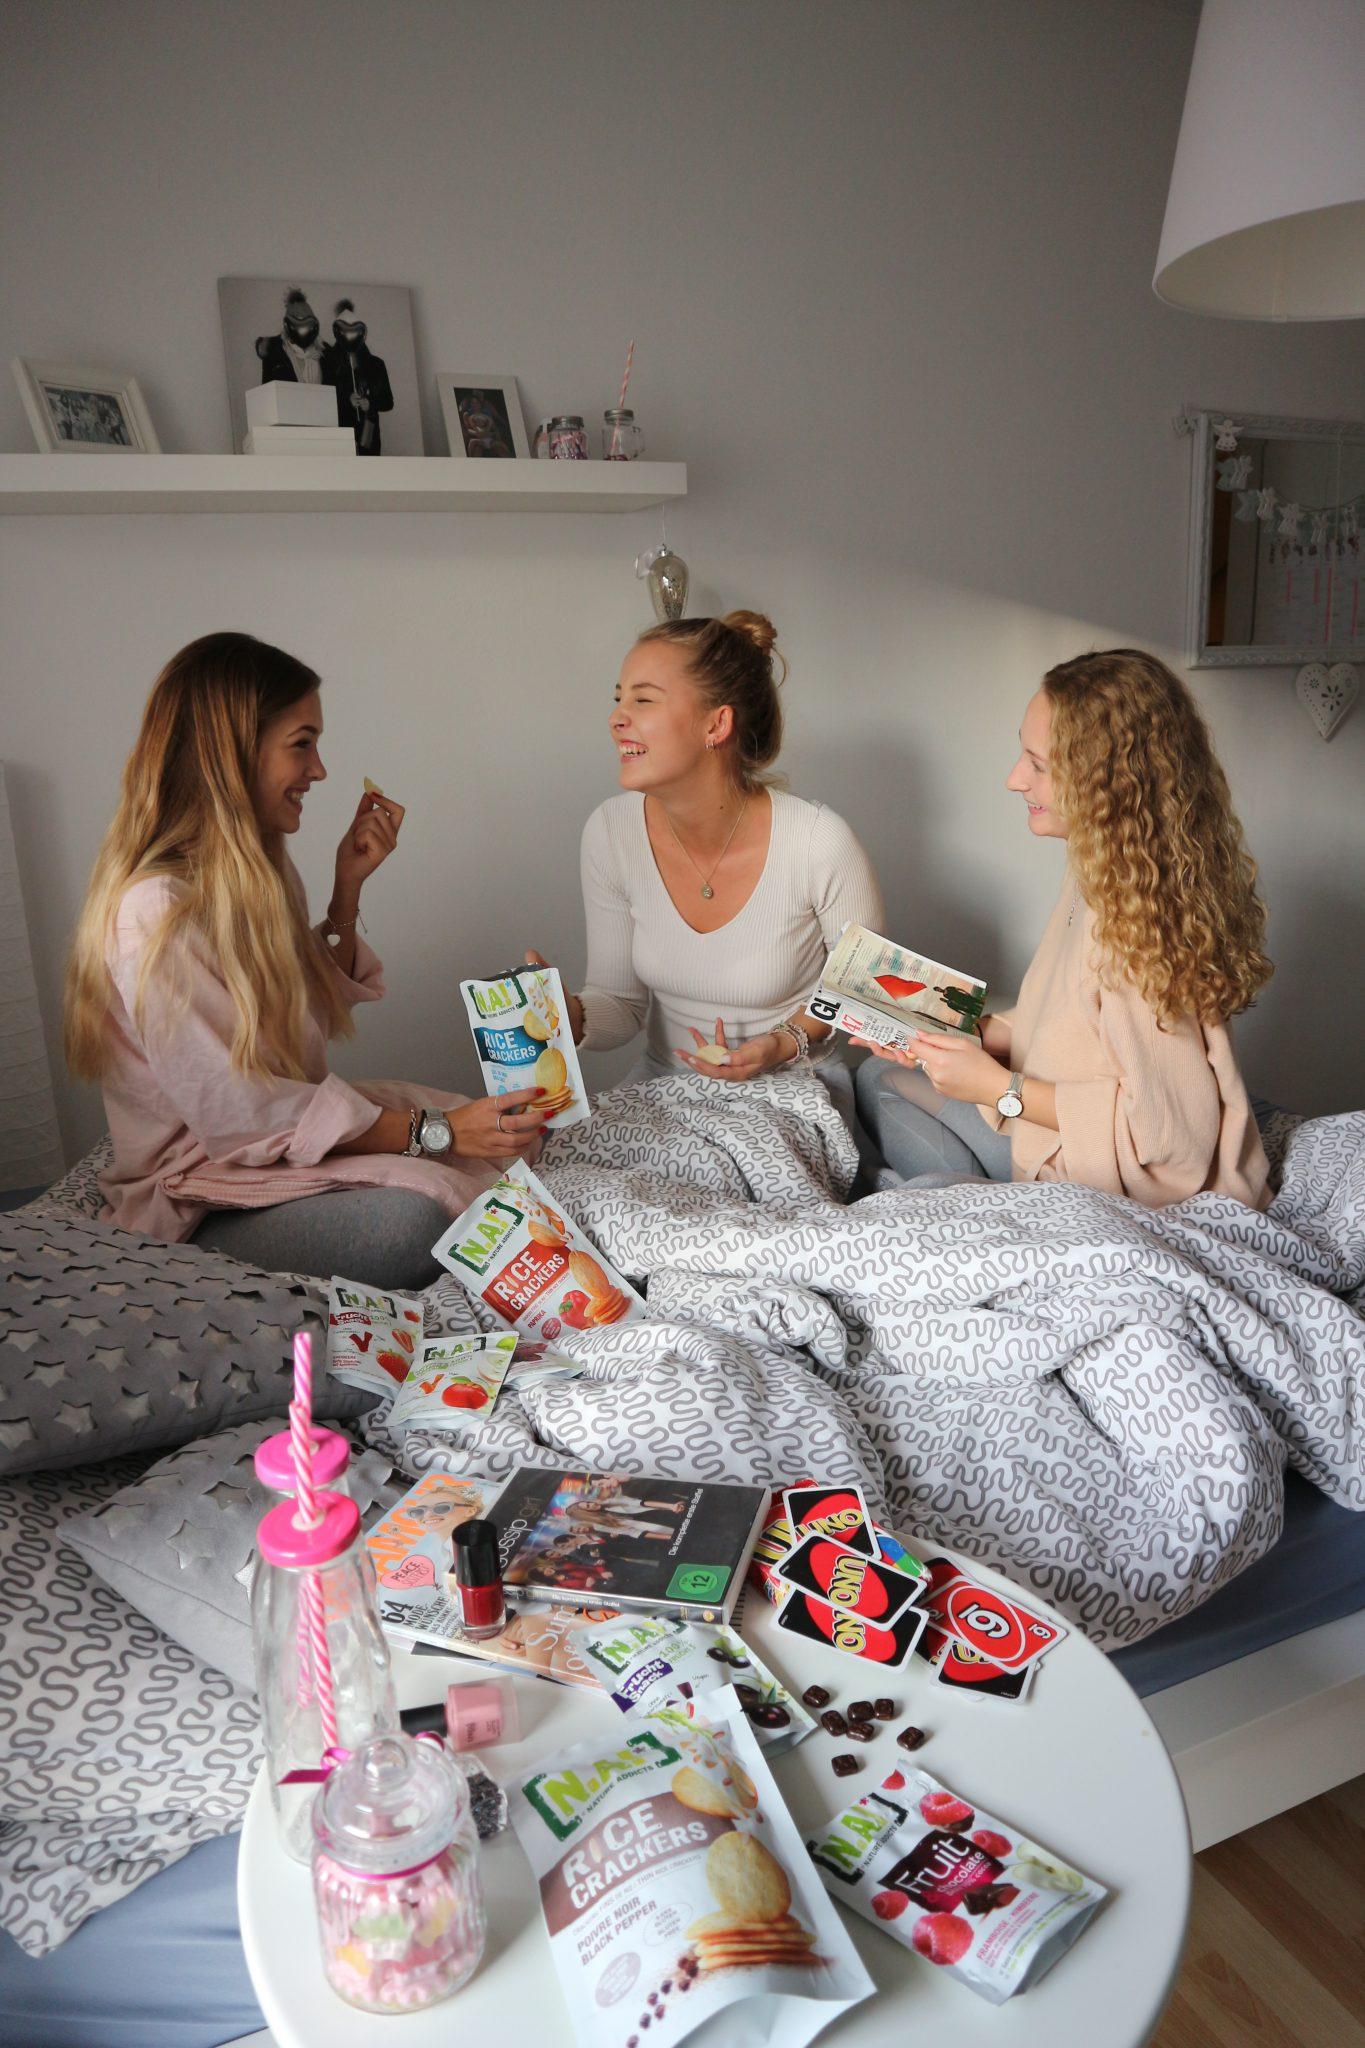 GIRLSNIGHT – SLEEPOVER PARTY CHECKLISTE